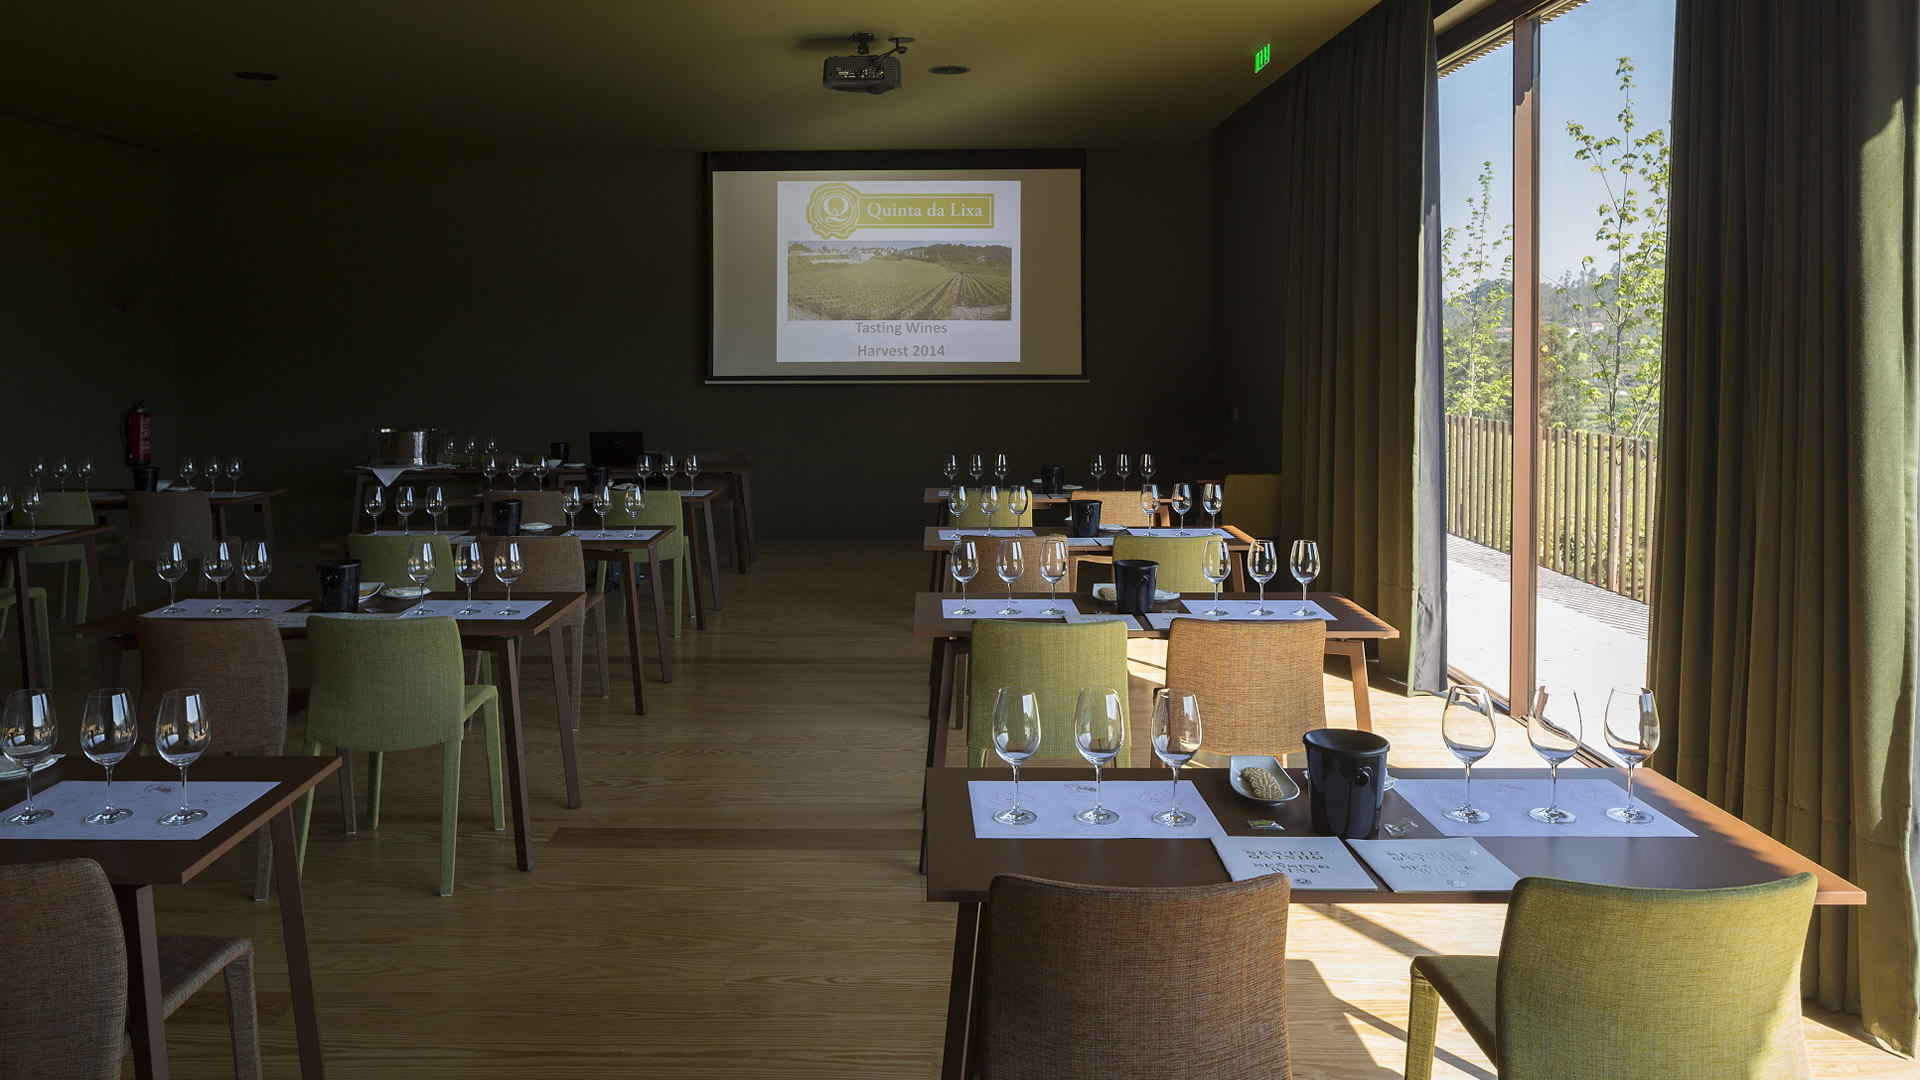 Monverde – Terras do Minho Wine & Food Tasting